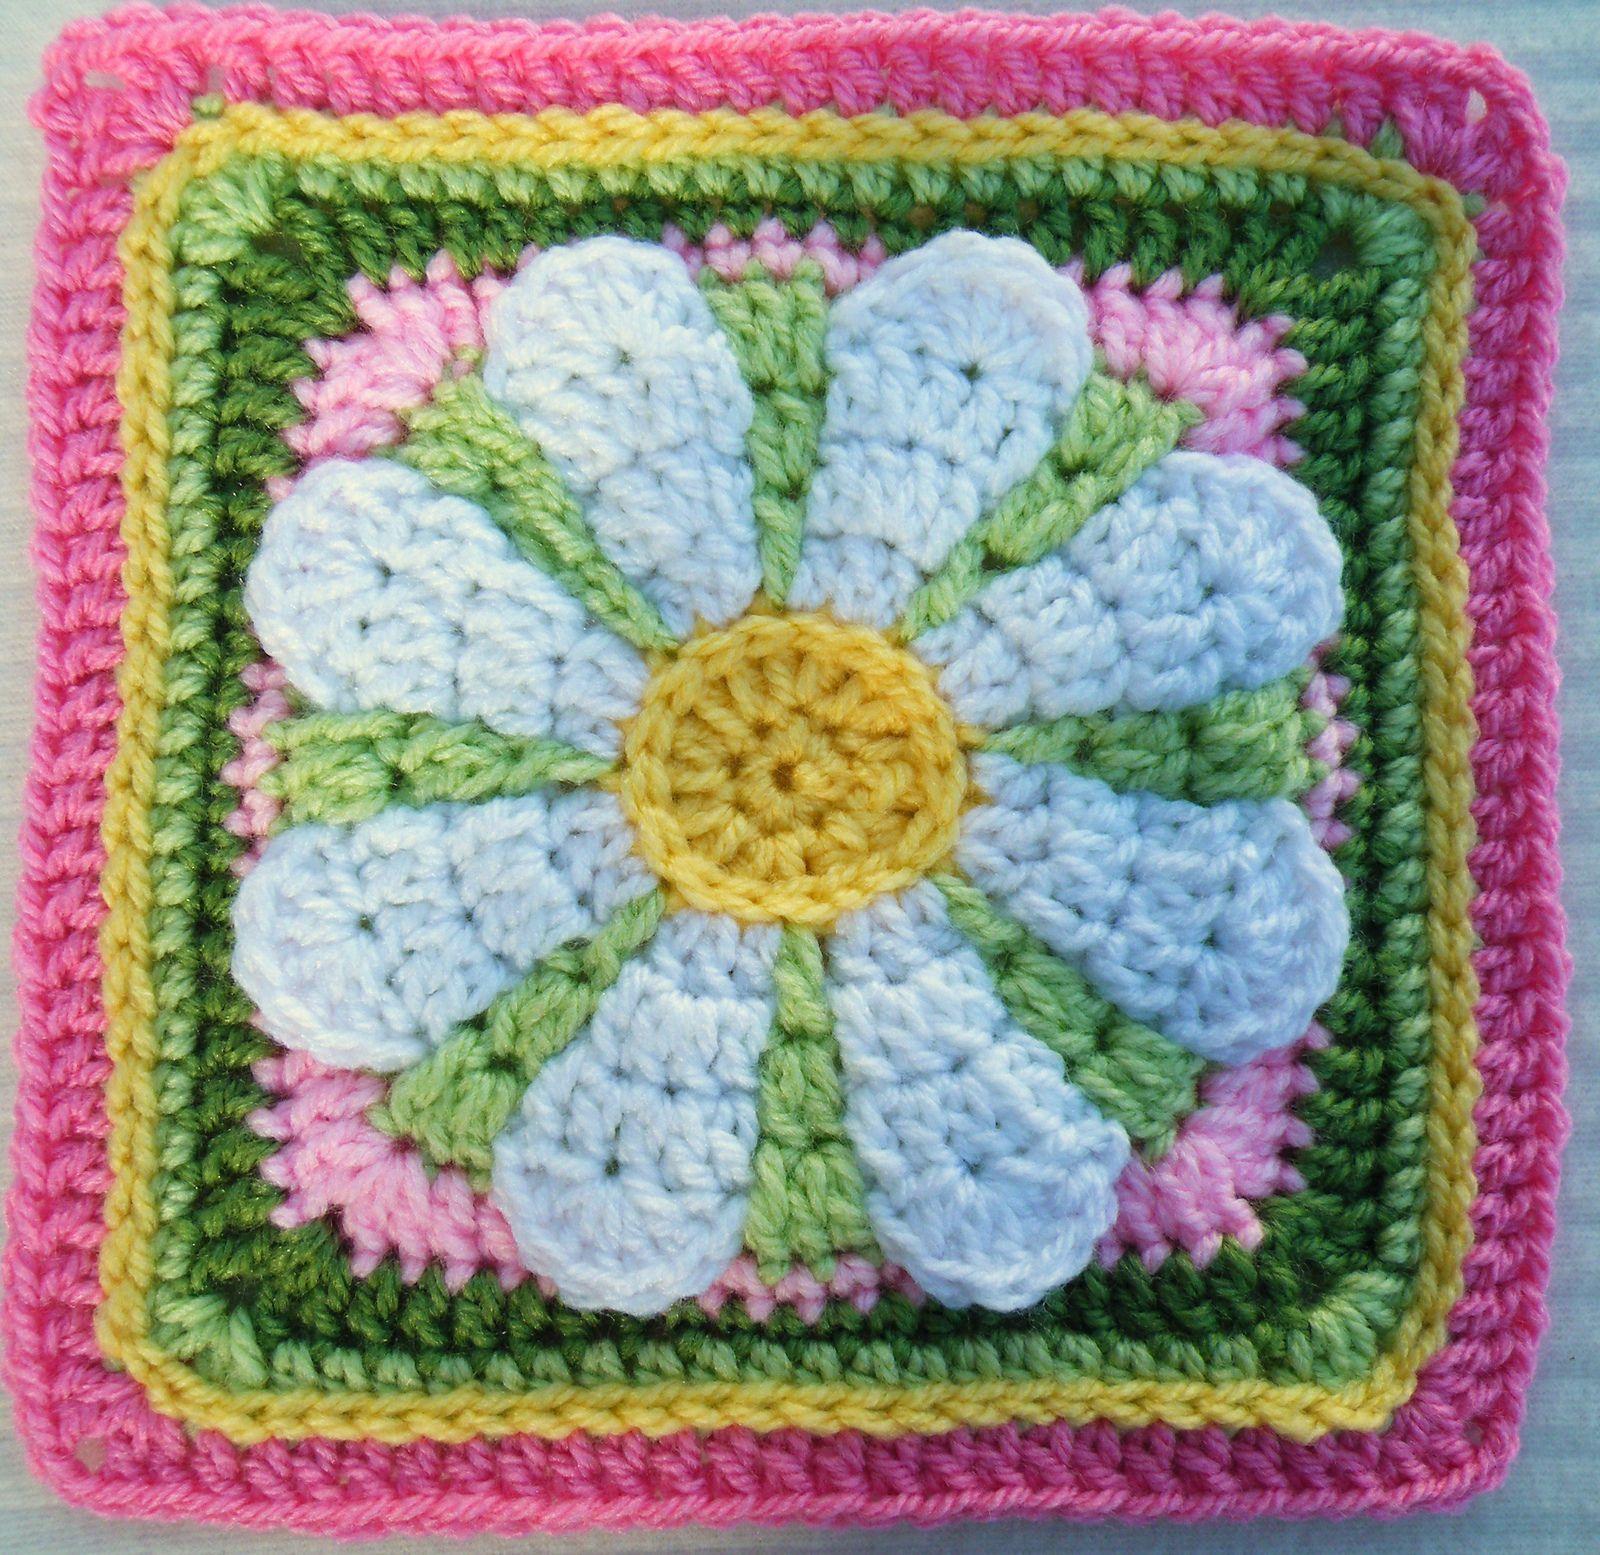 Ravelry maryfairys daisy flower week 23 bawl cal crochet ravelry maryfairys daisy flower week 23 bawl cal izmirmasajfo